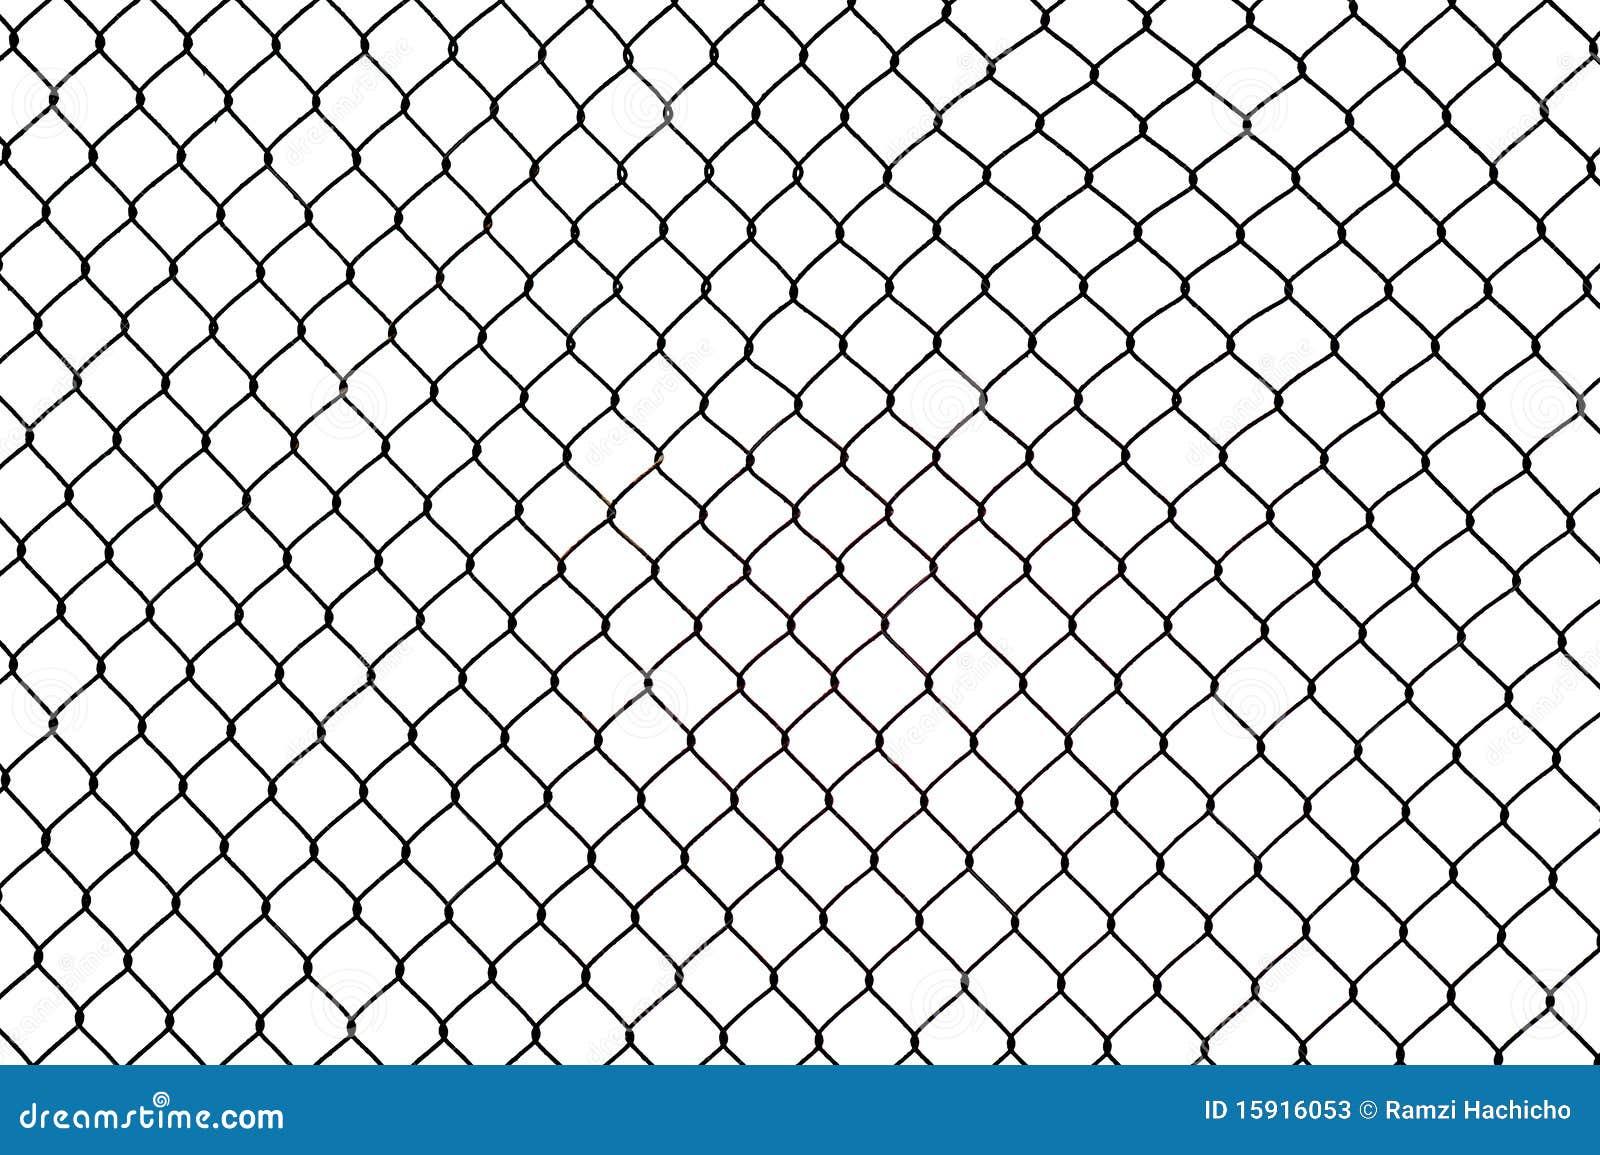 broken iron wire fence 15916053 broken wire fence on wire mesh industries